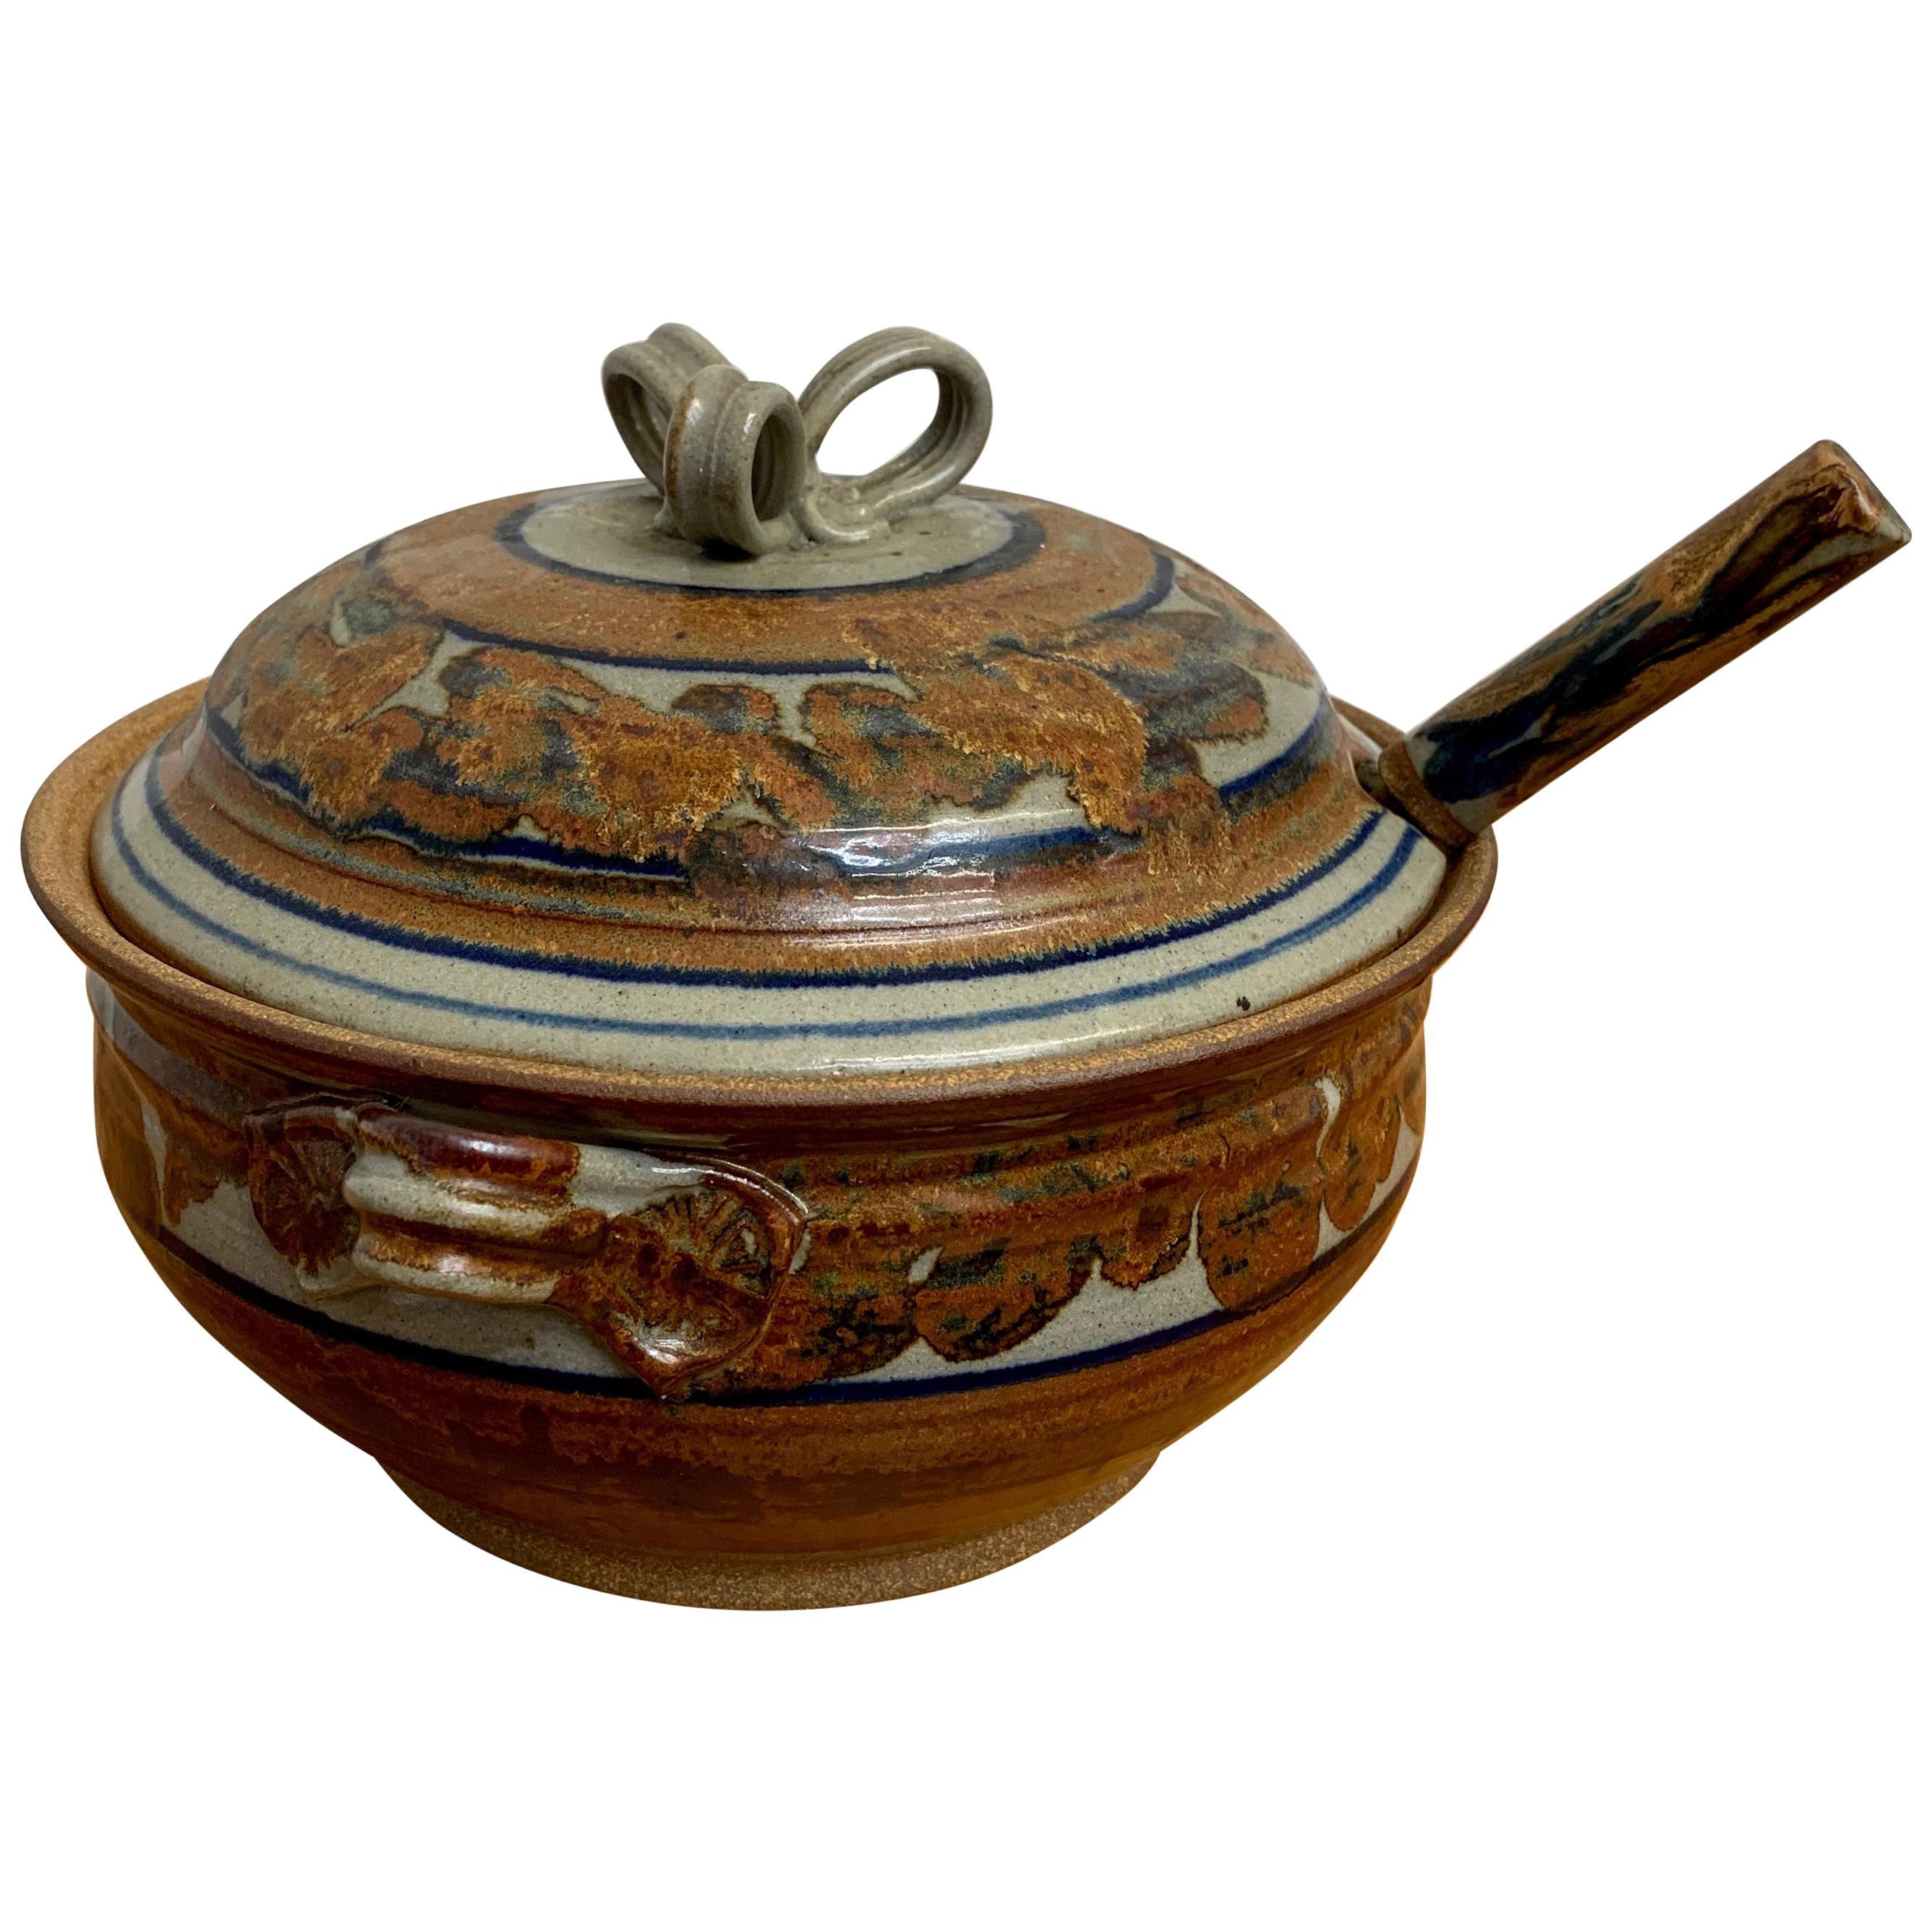 1960s Stoneware Soup Tureen